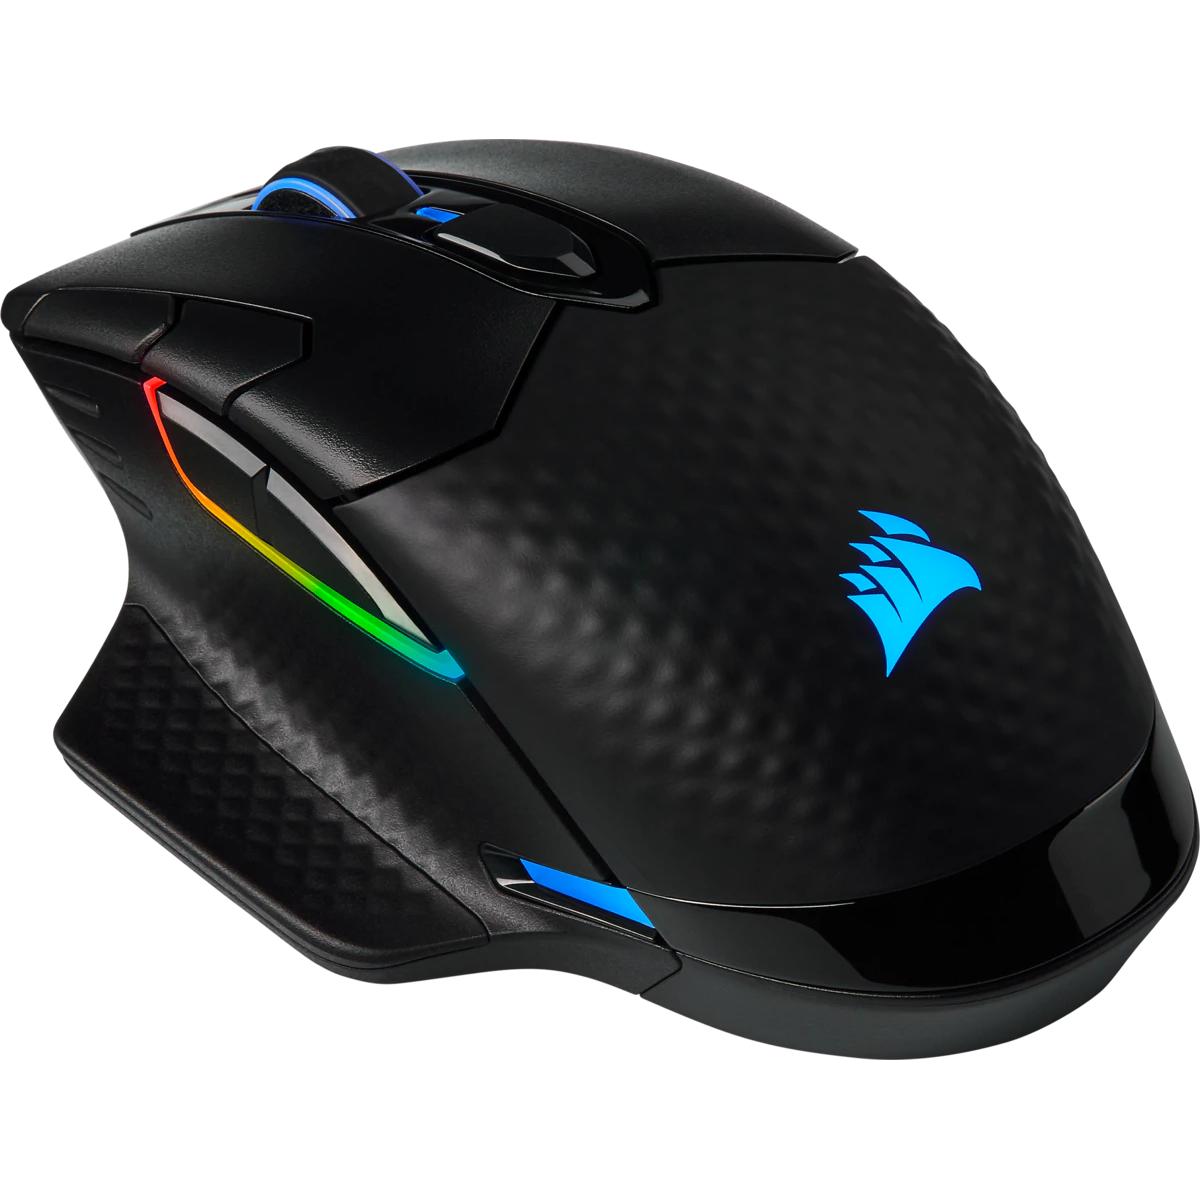 Mouse Gamer Sem Fio Corsair Dark Core RGB PRO SE, 18.000DPI, 8 Botões Programáveis, Black, CH-9315511-NA